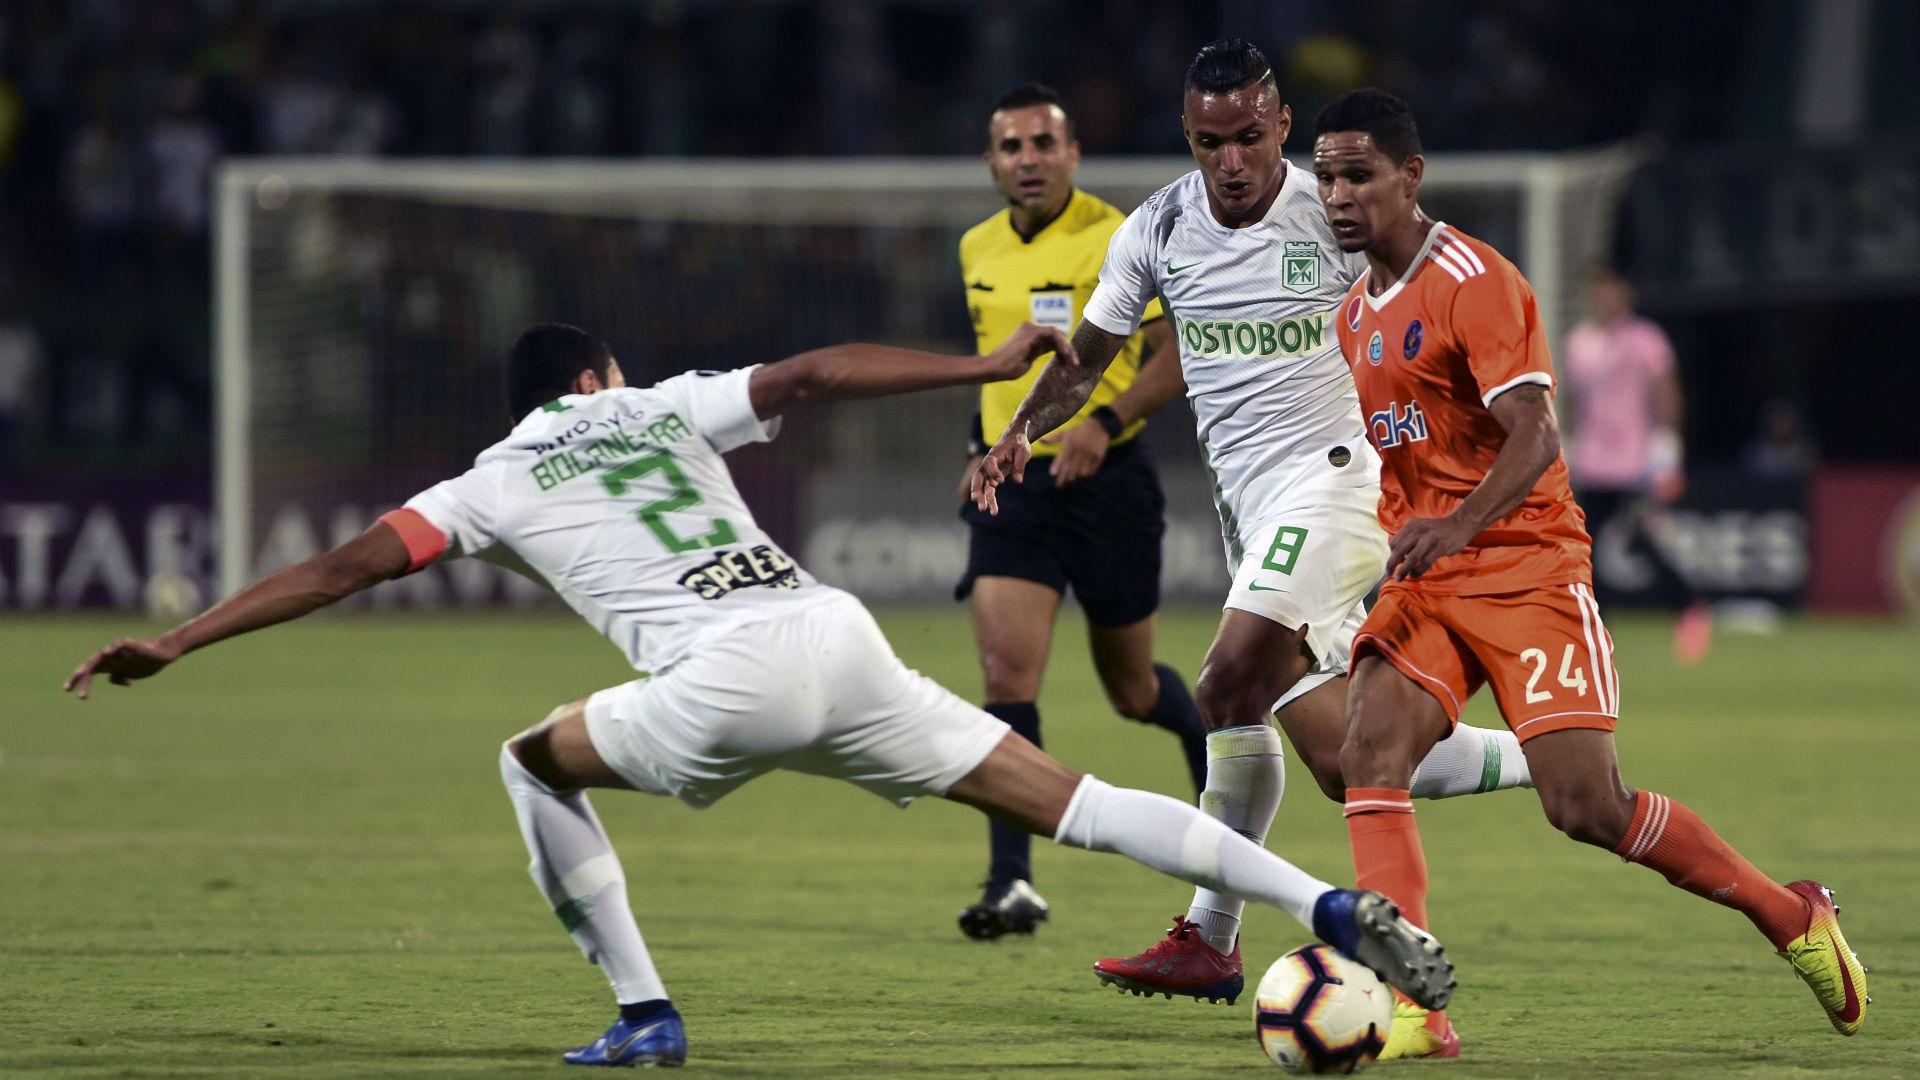 Atlético Nacional - Deportivo La Guaira Copa Libertadores 2019